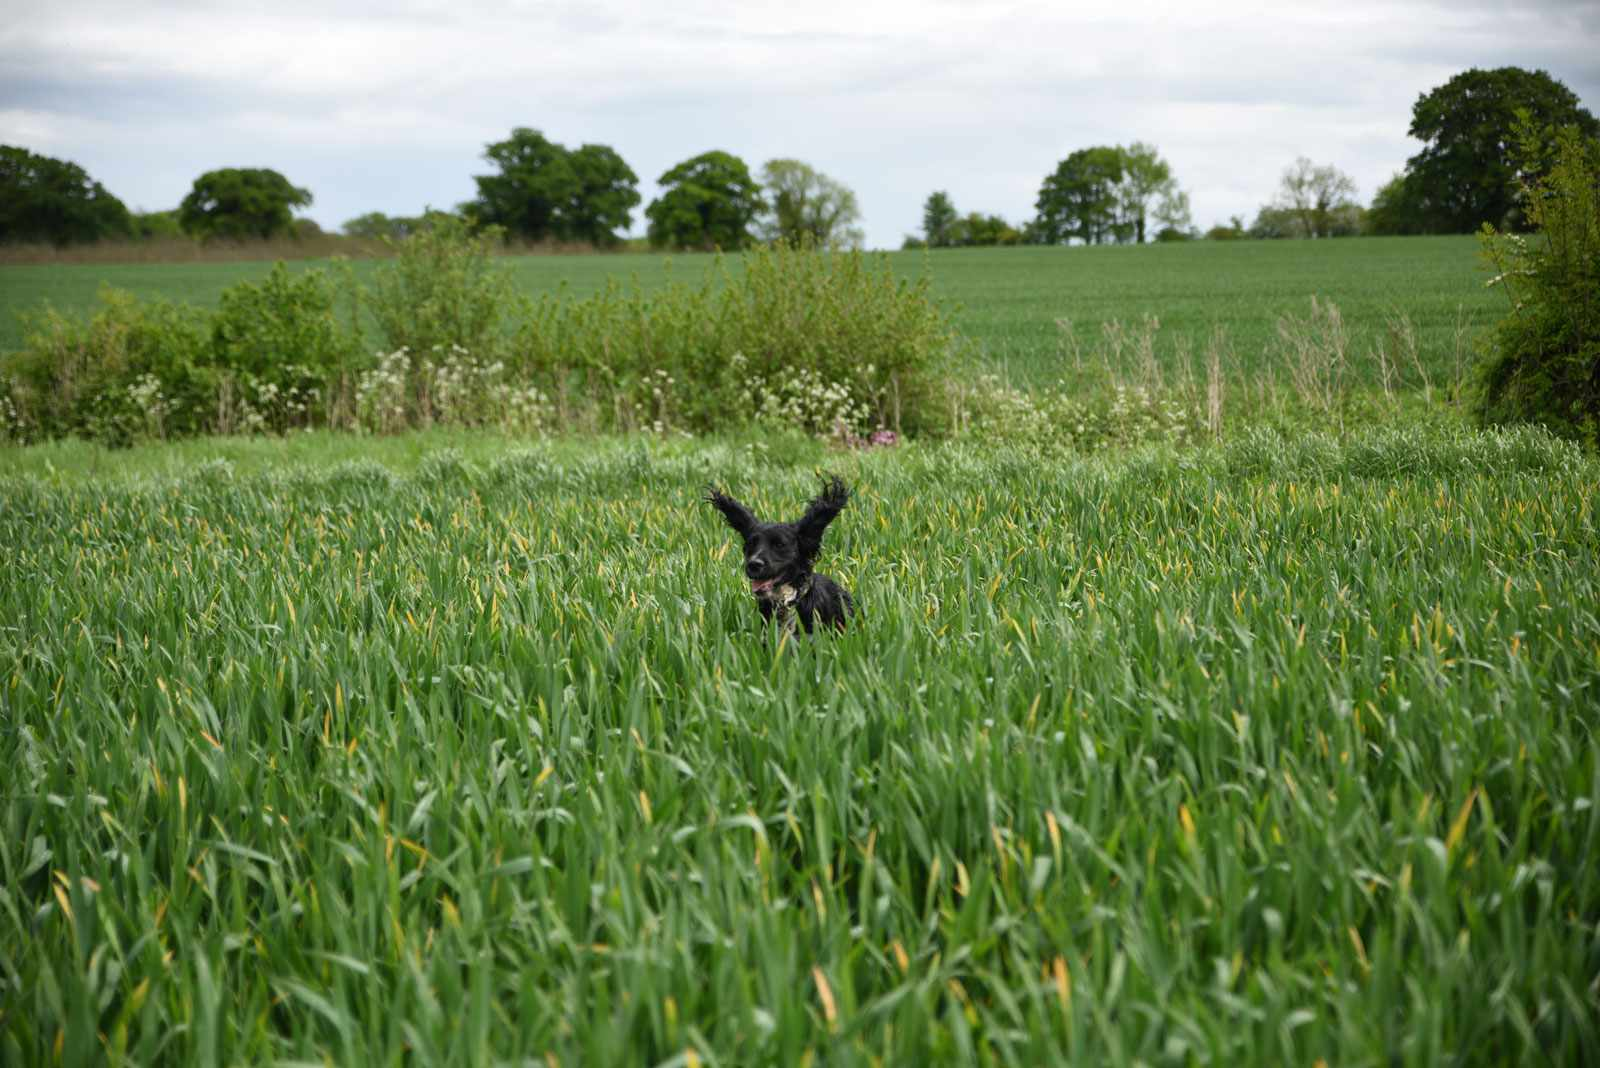 dog-in-long-grass-67333f1